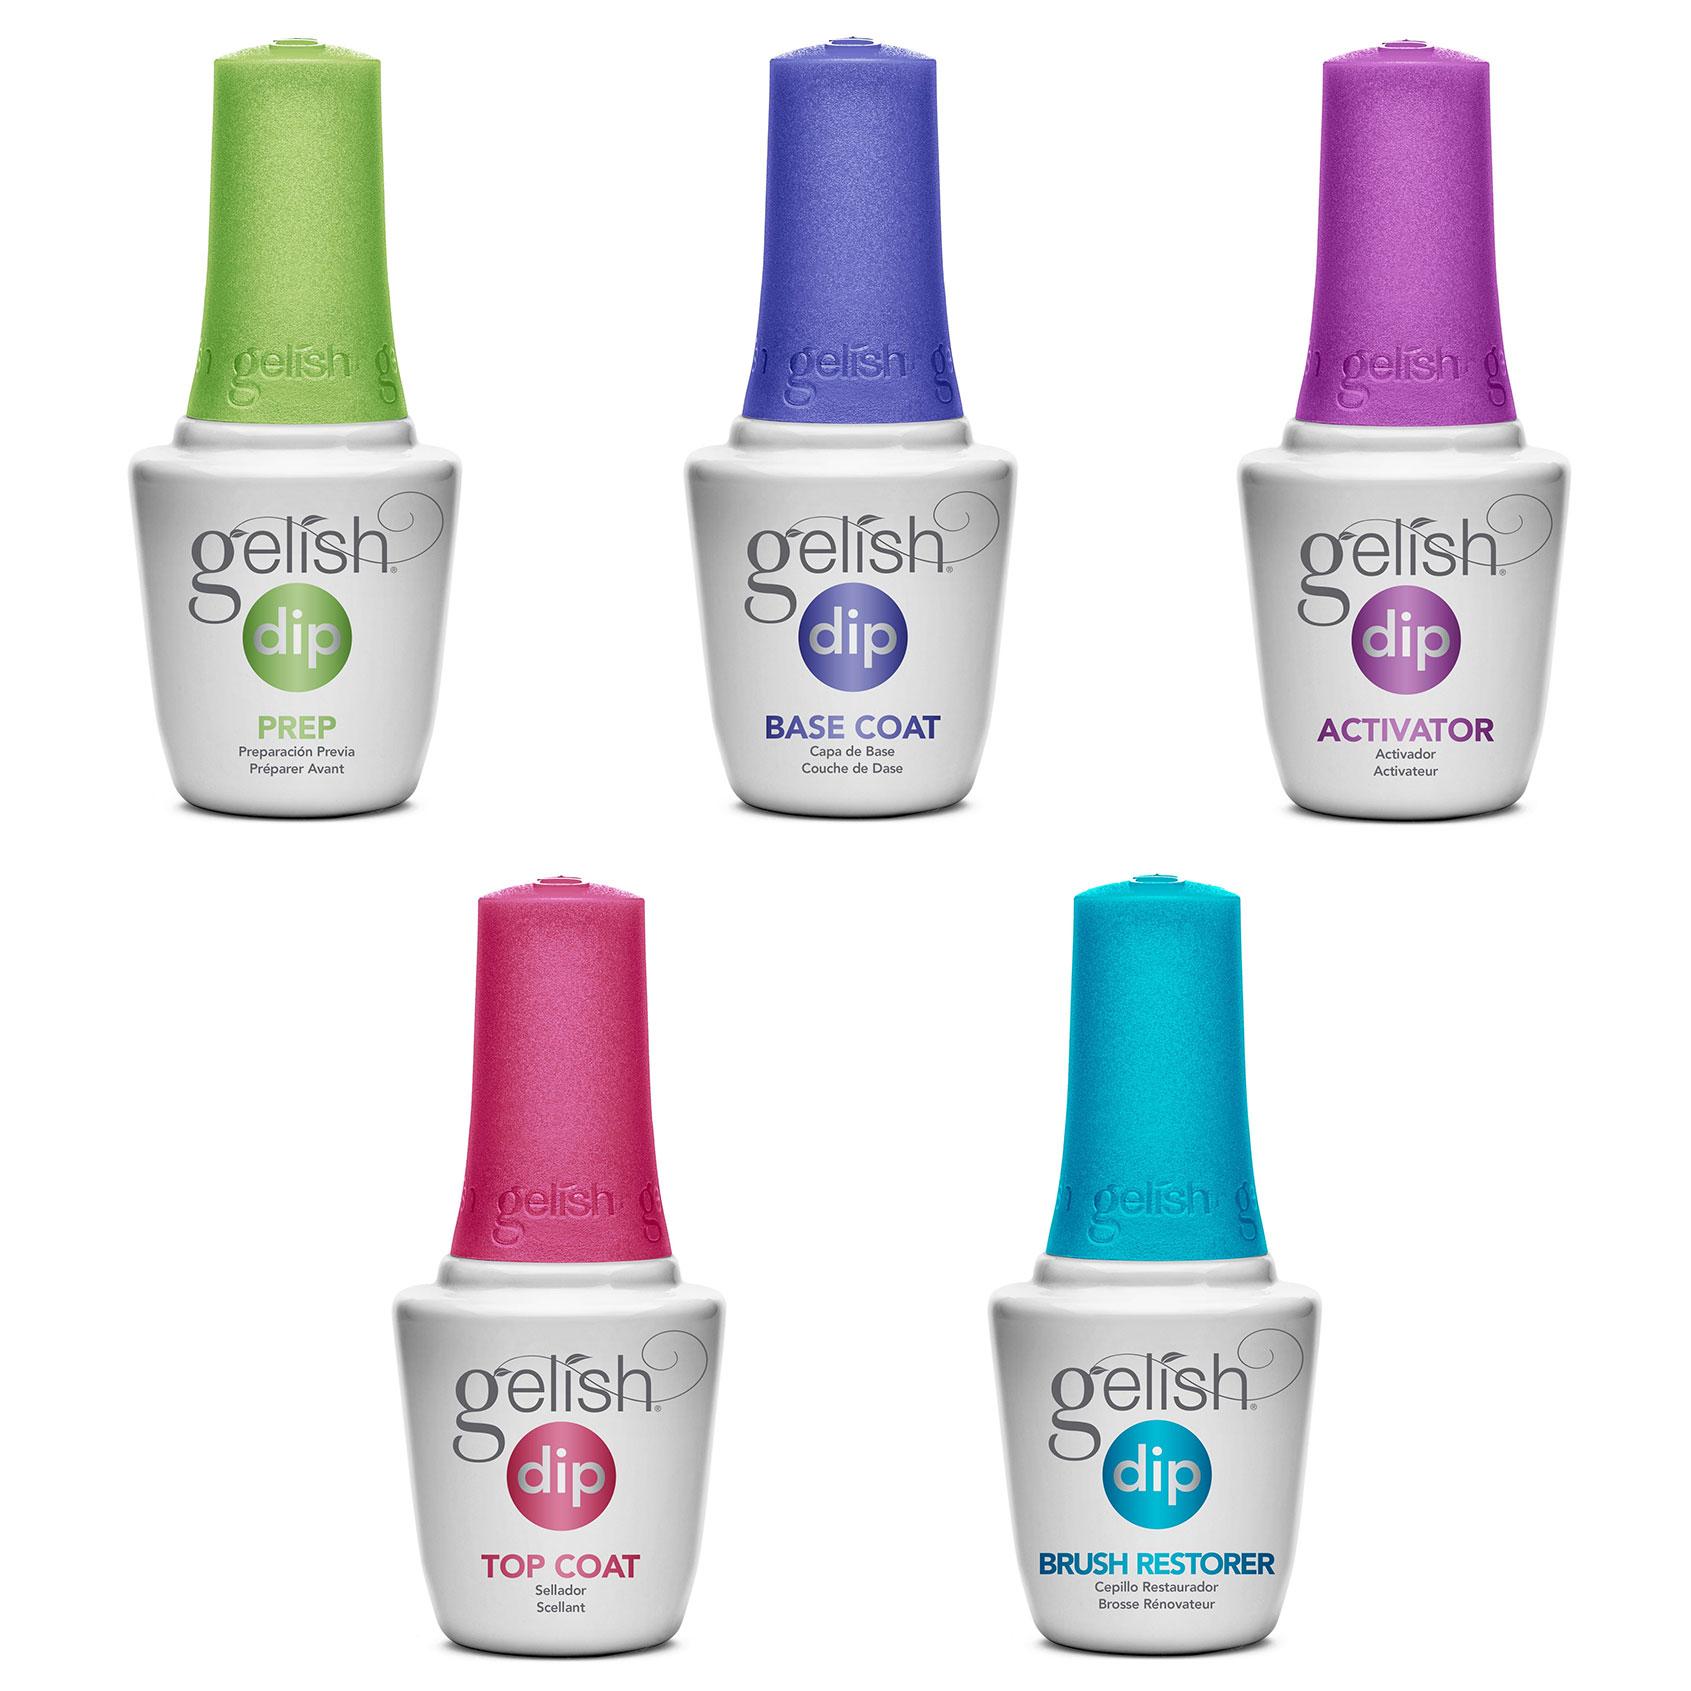 Gelish Soak Off Basix Acrylic Powder Nail Polish Dip Manicure Set ...